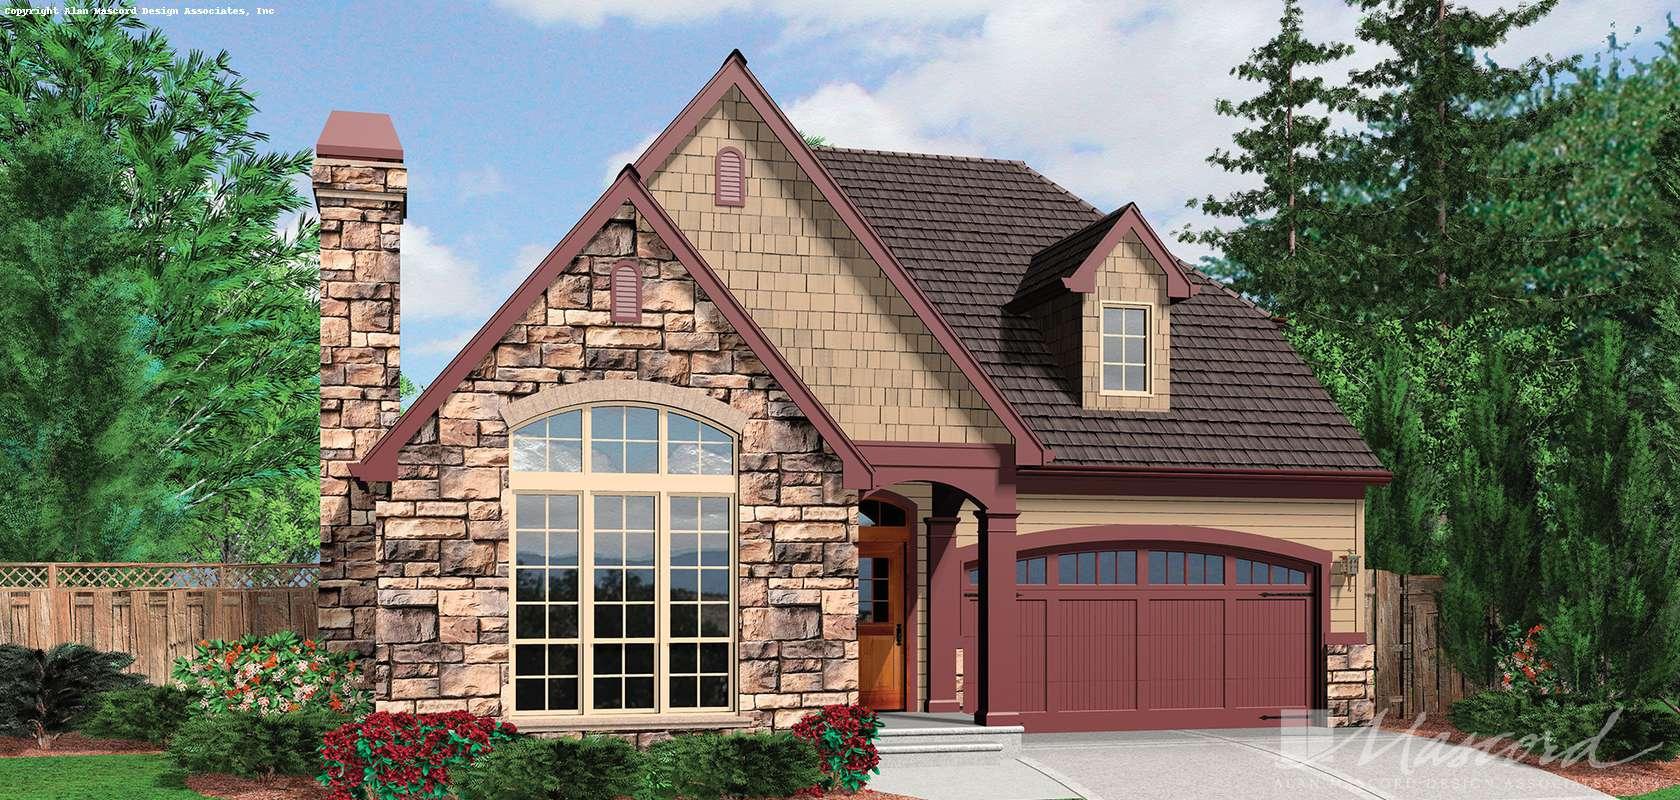 Mascord House Plan 21102: The Miranda